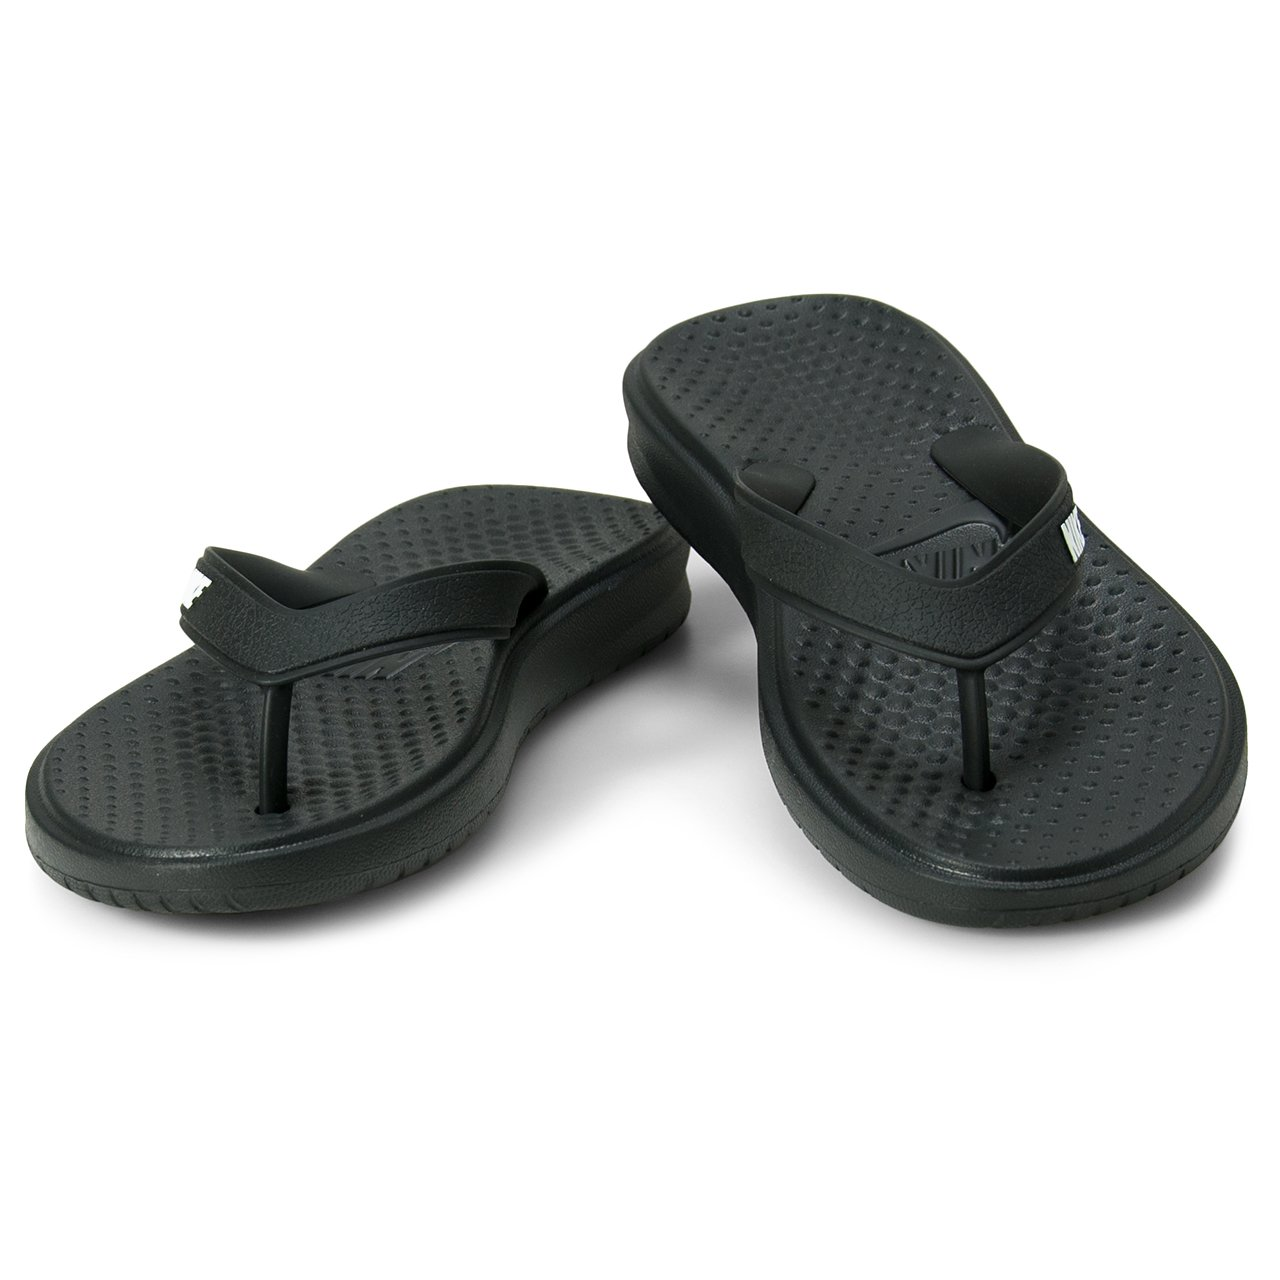 Nike Nike Solay Thong Mens Sandals 882690 005 7 Black White